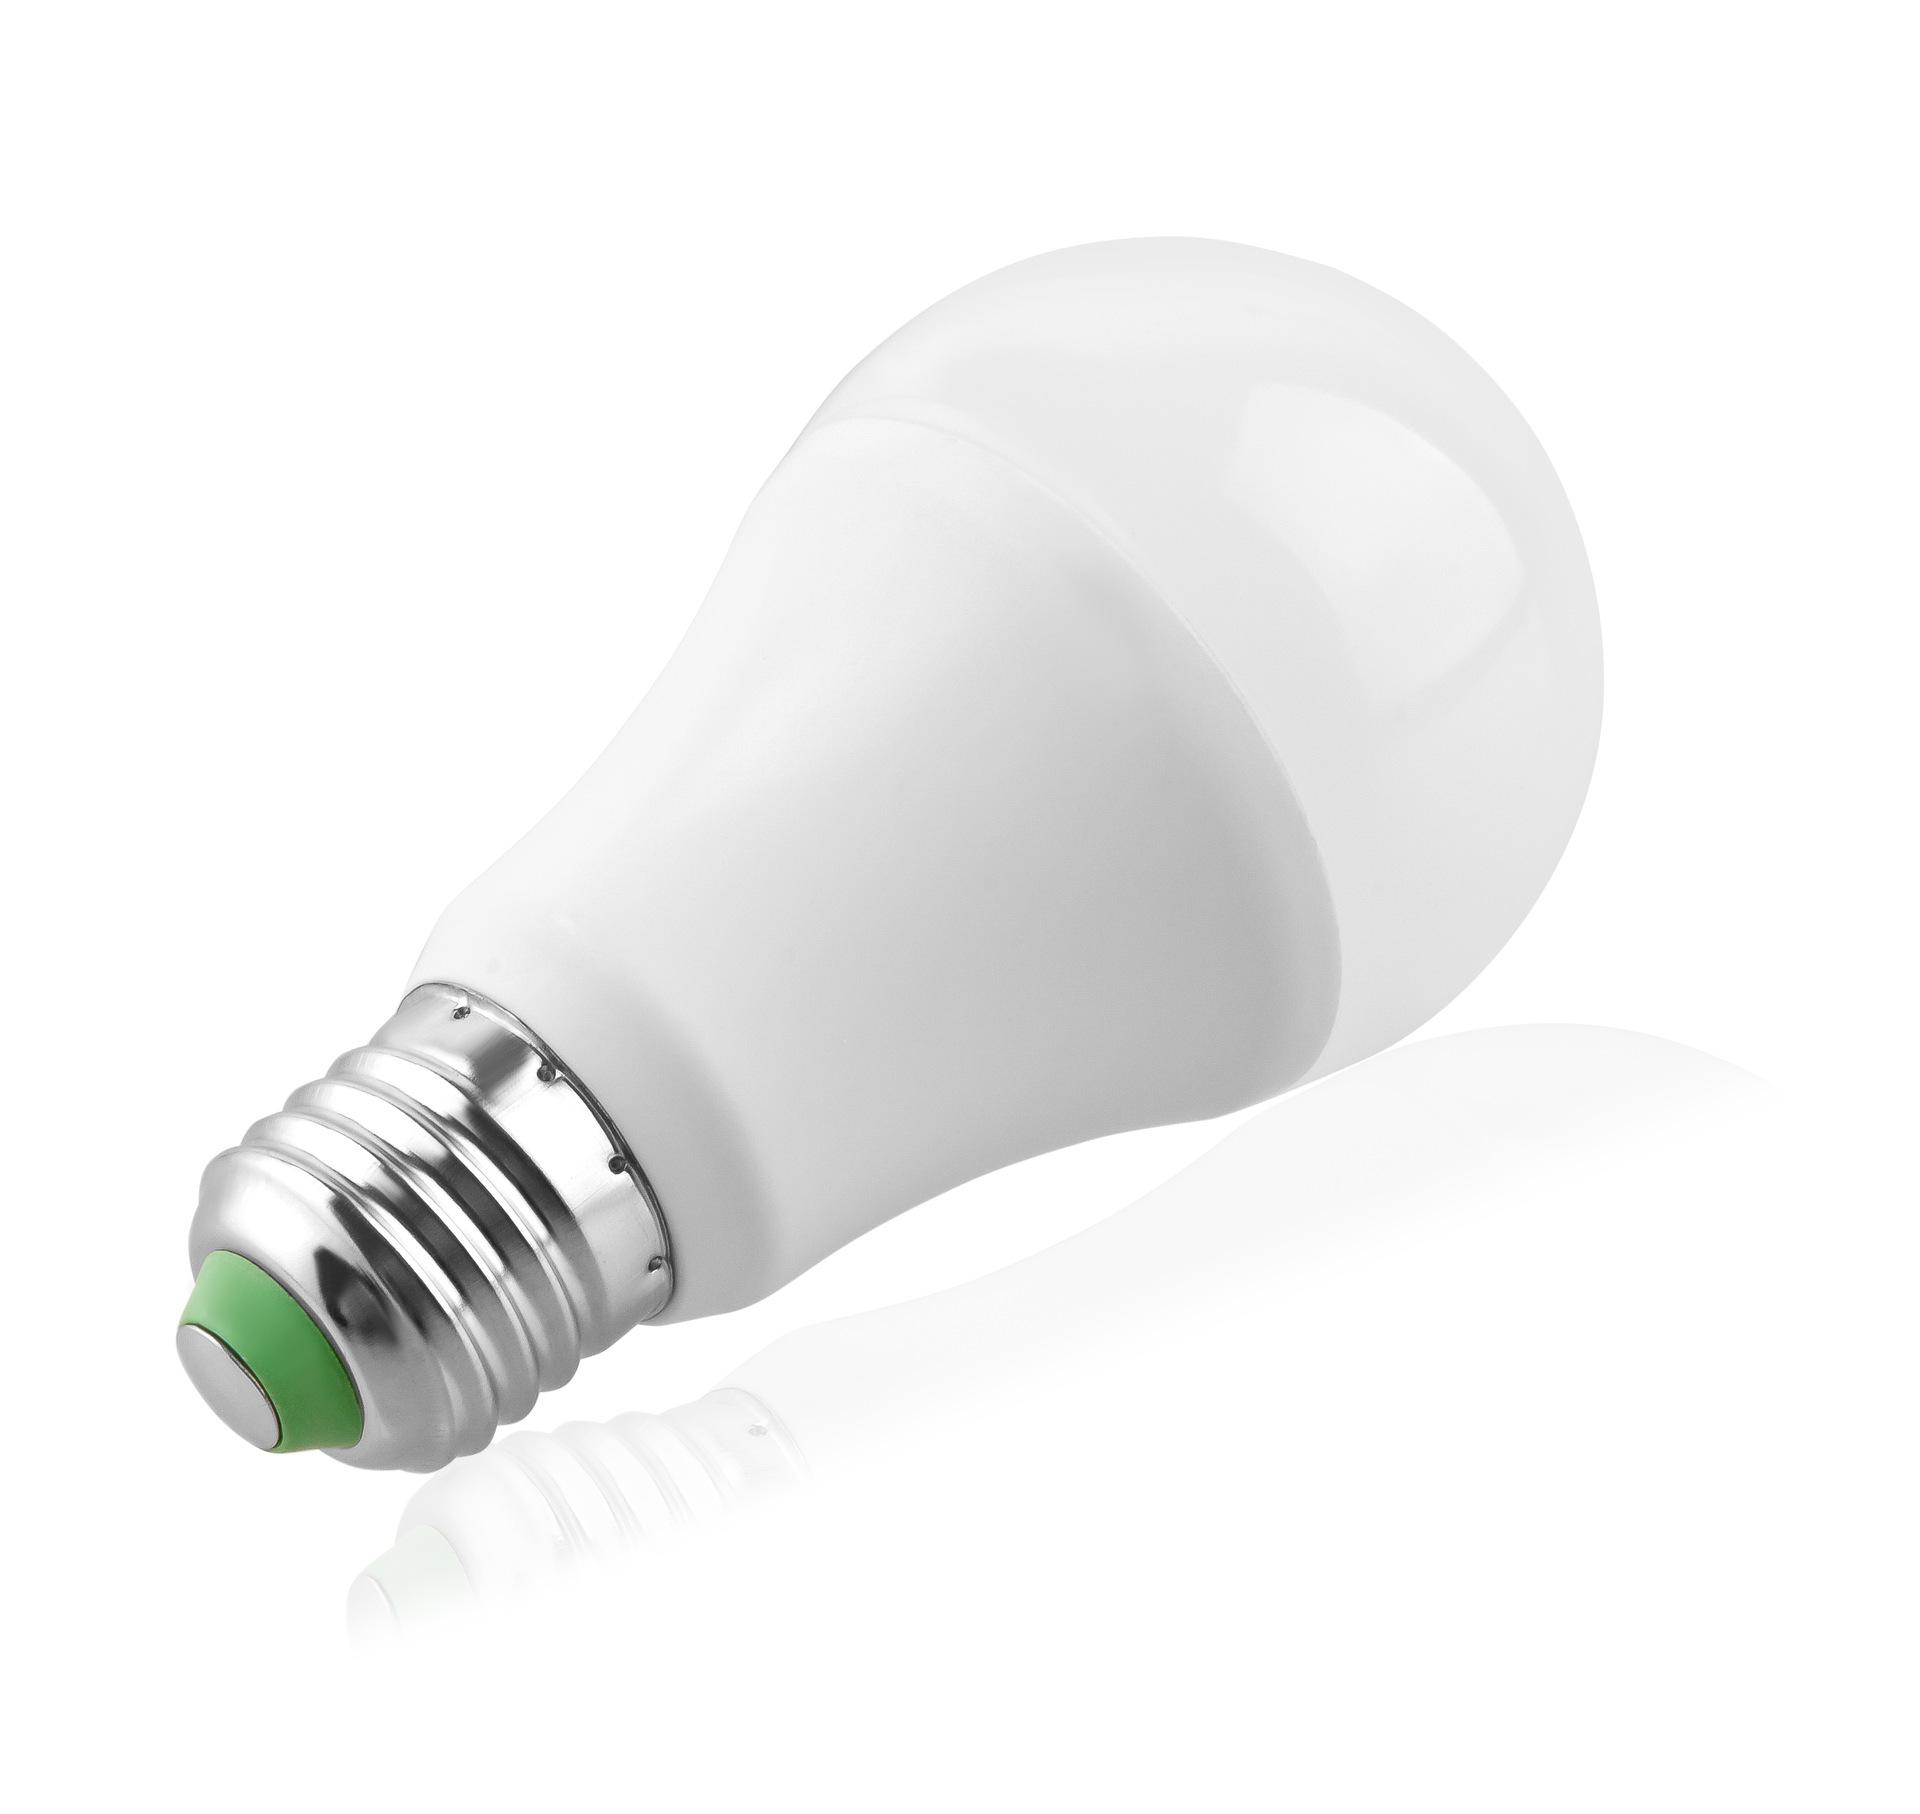 RIZHENGDA 7W microwave bulb light! Radar sensor LED bulbs are newly launched